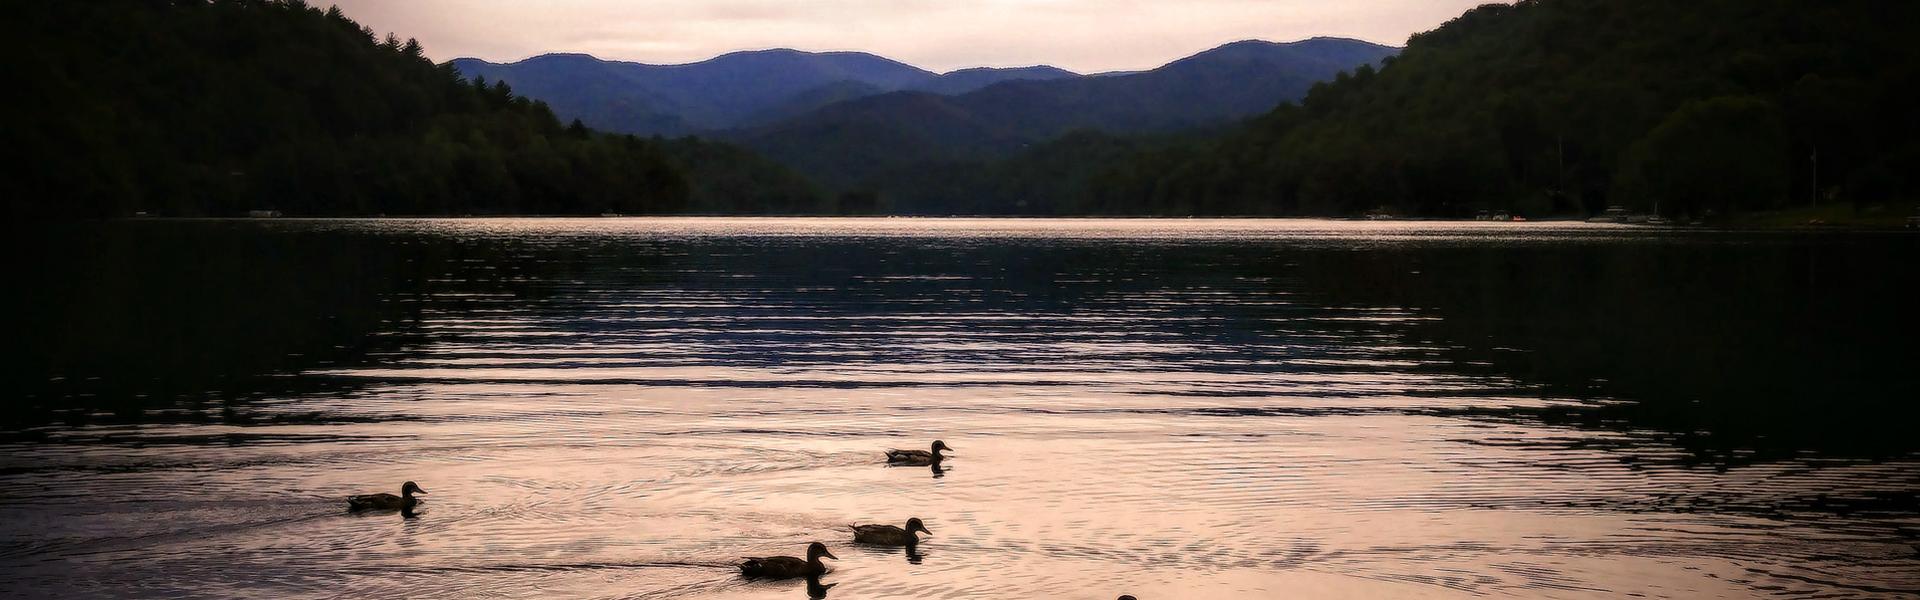 Mtn Lake Ducks